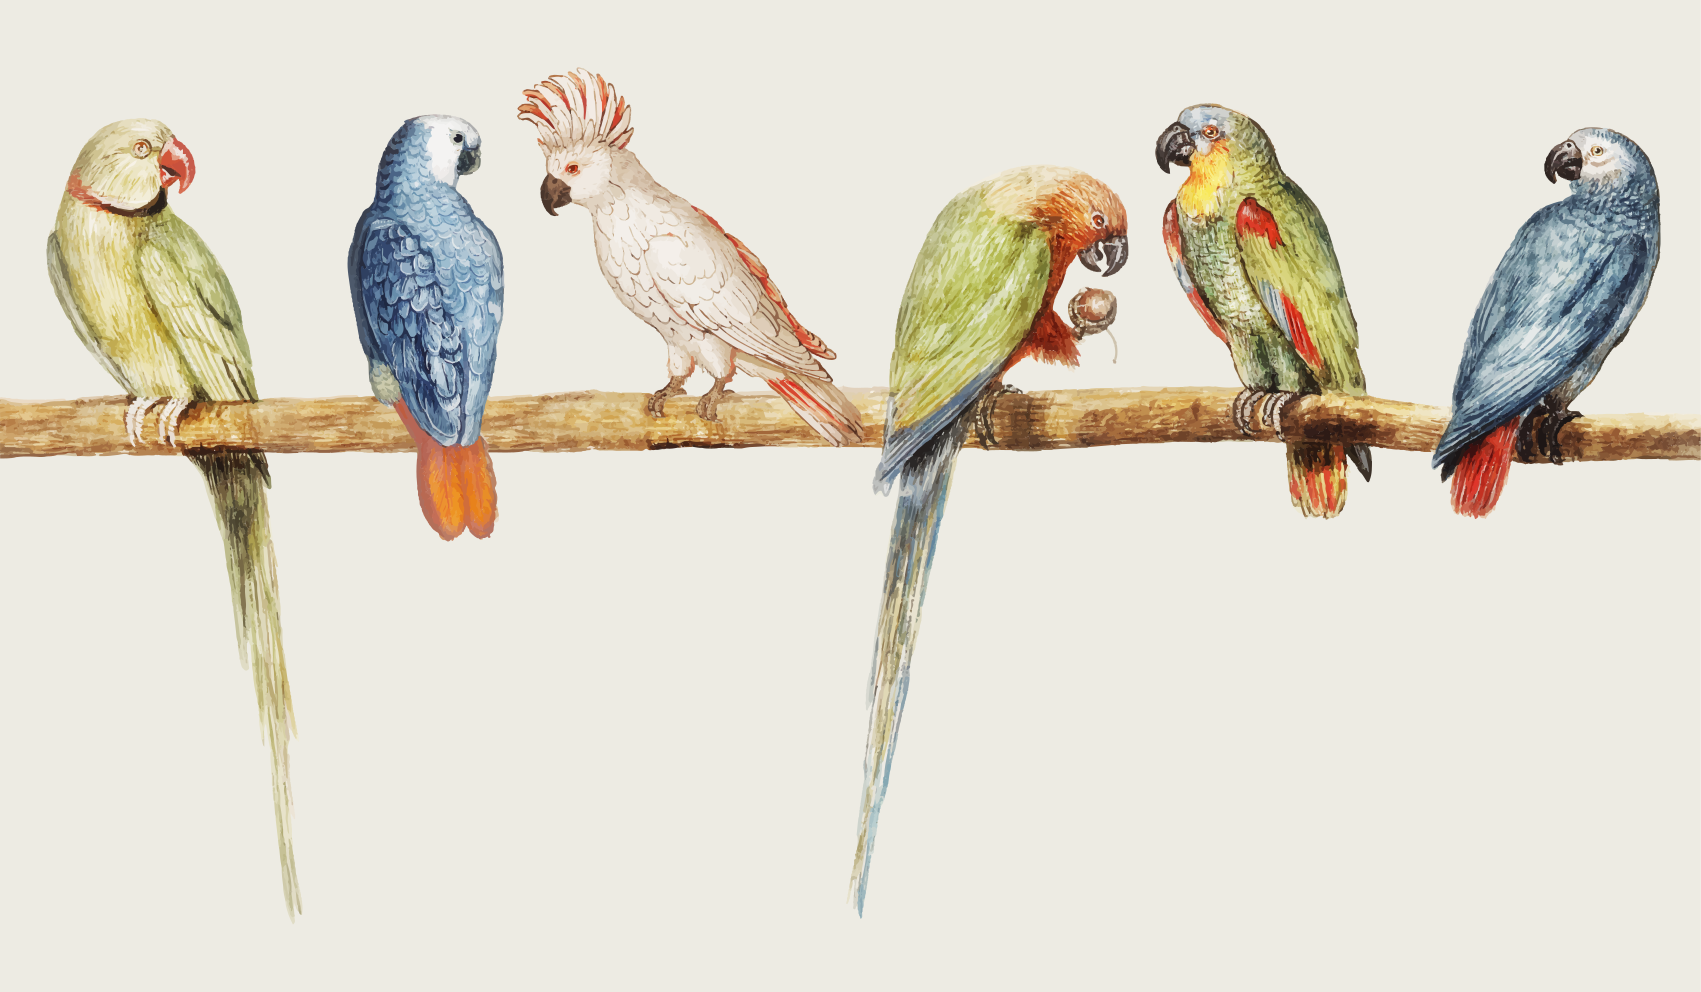 TenStickers. μοντέρνο γκρι με κουβέρτα λουλουδιών πουλιών και κλαδιών. χαλί βινυλίου με παπαγάλους. παρουσιάζει διαφορετικούς πολύχρωμους παπαγάλους που κάθεται σε ένα κλαδί. Είναι κατασκευασμένο από υψηλής ποιότητας βινύλιο και μπορείτε να επιλέξετε οποιοδήποτε μέγεθος.